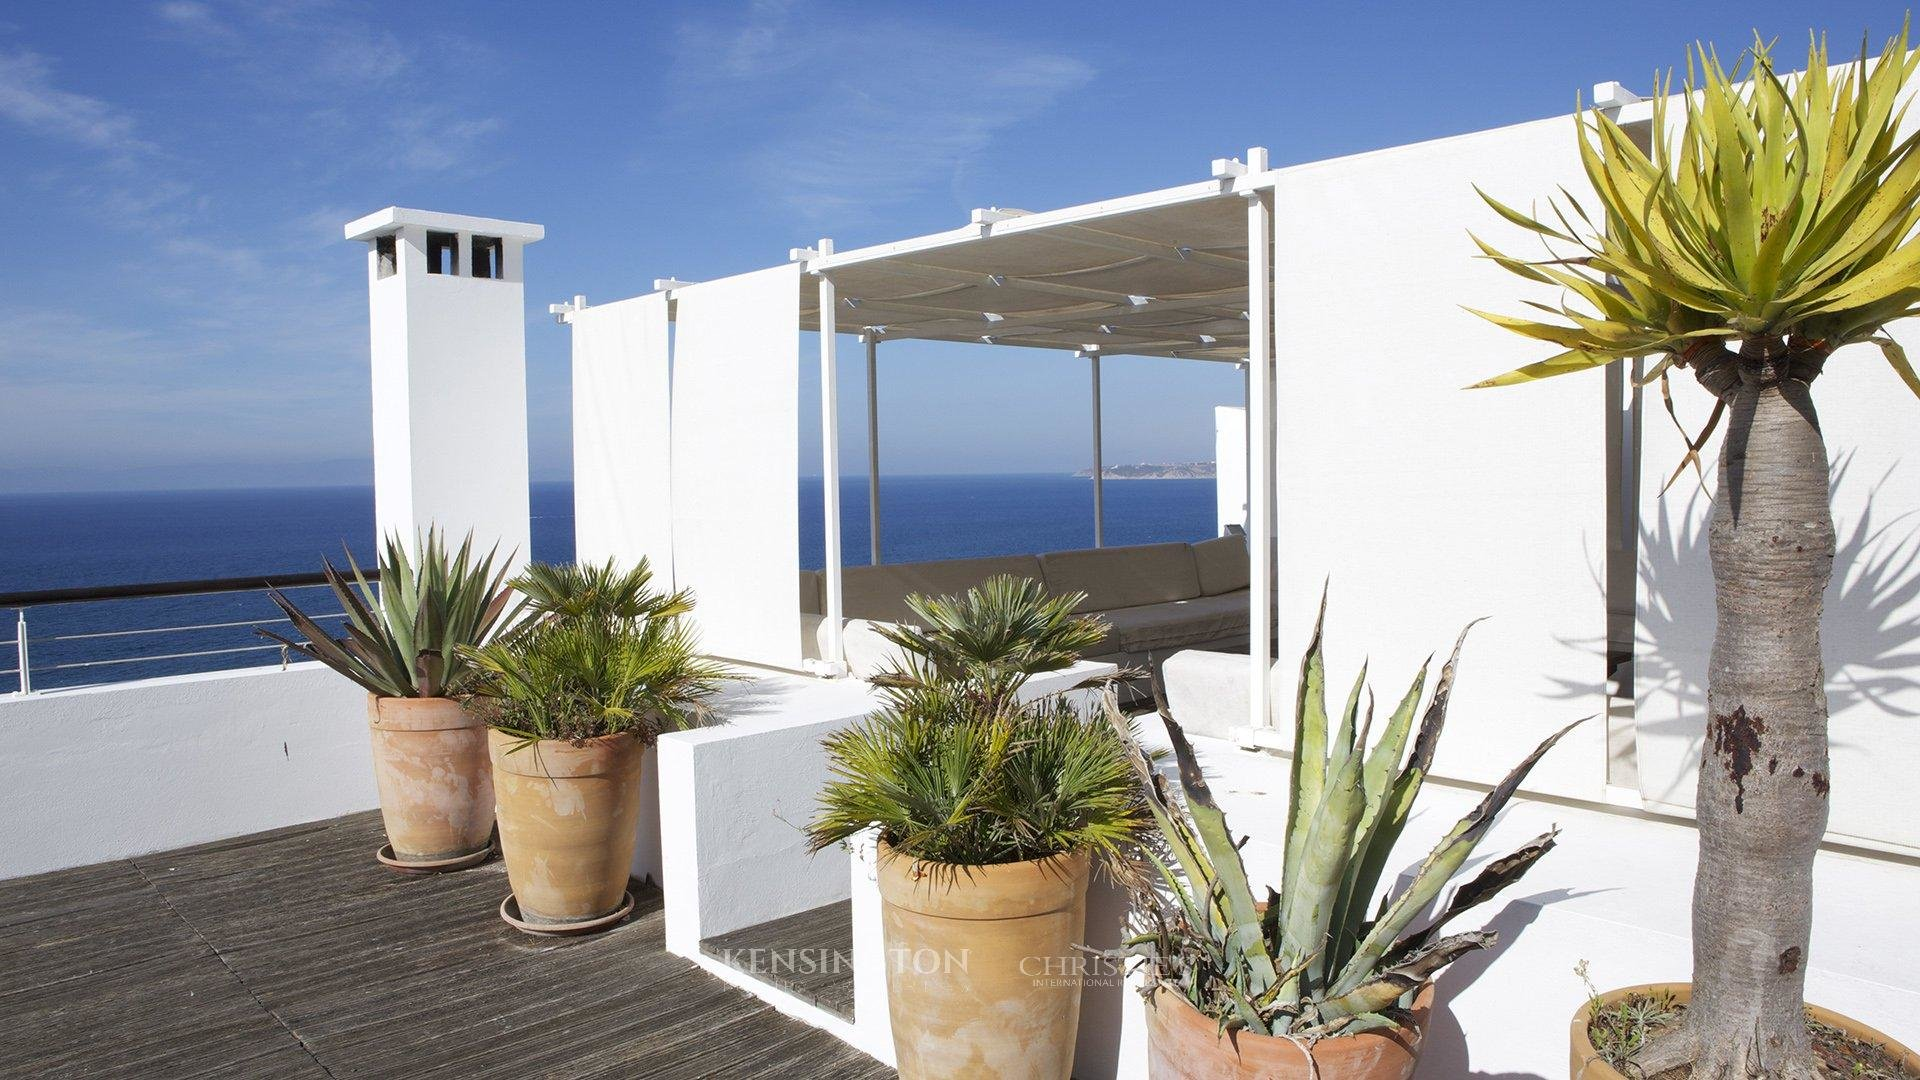 KPPM00750: Villa Putman Luxury Villa Tanger Morocco